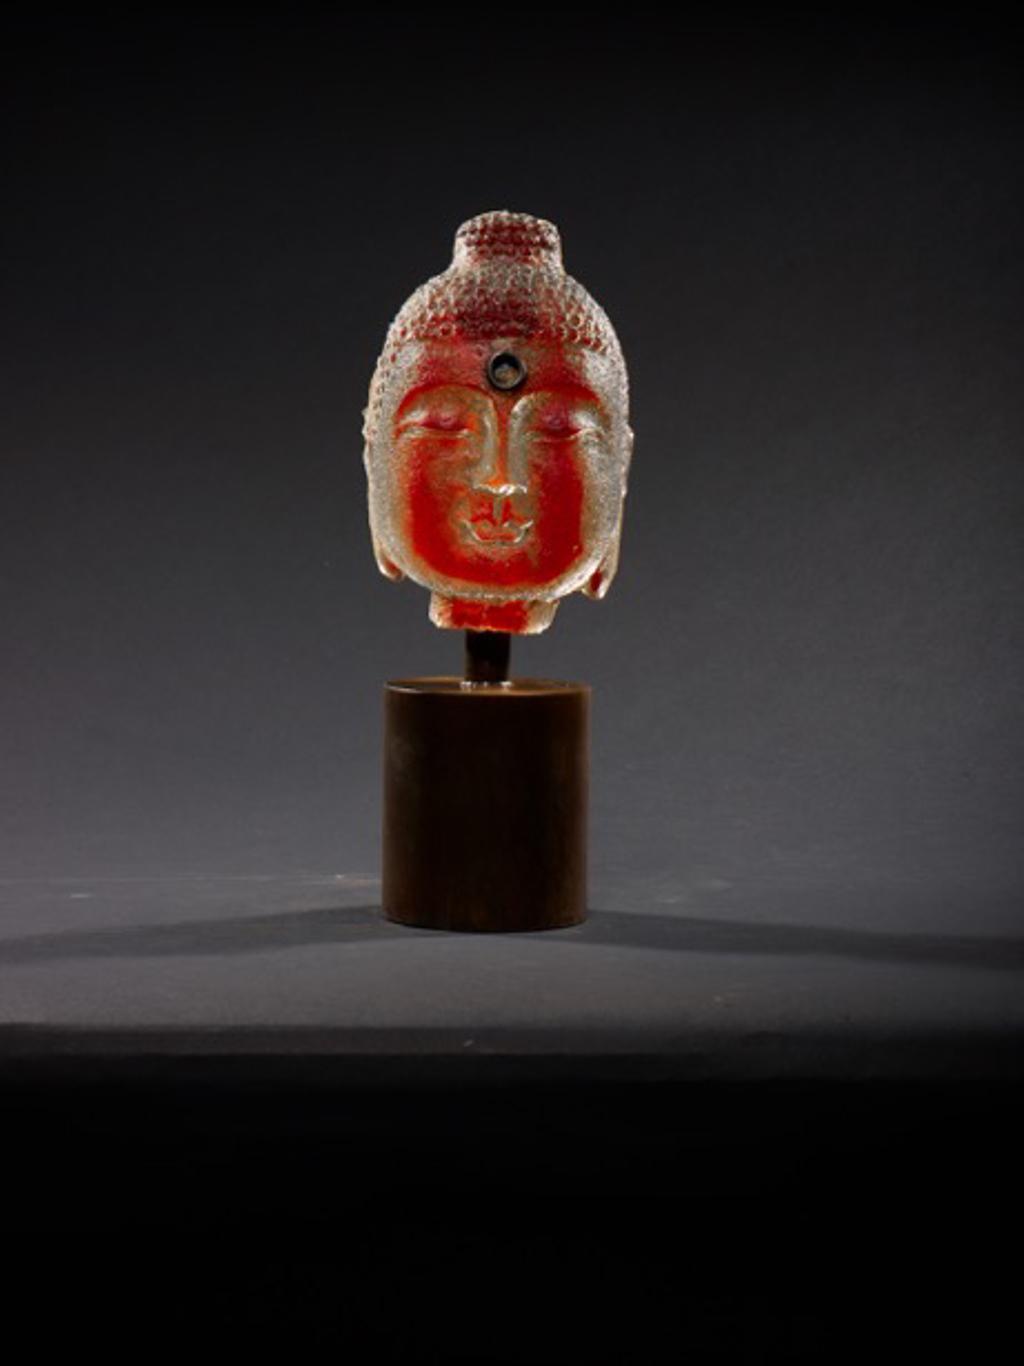 Bookshelf Buddha - Red by Marlene Rose (b. 1967)